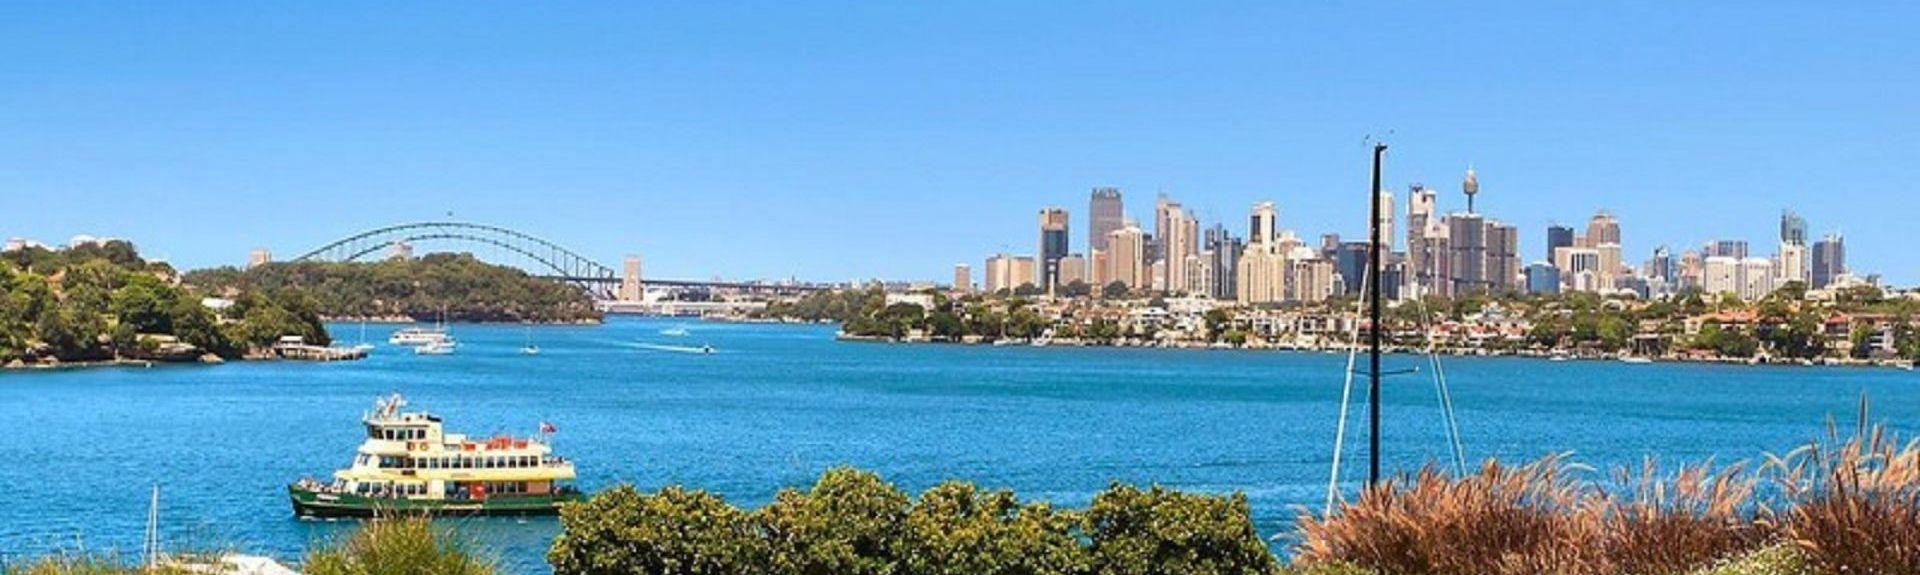 Waitara, New South Wales, Australien